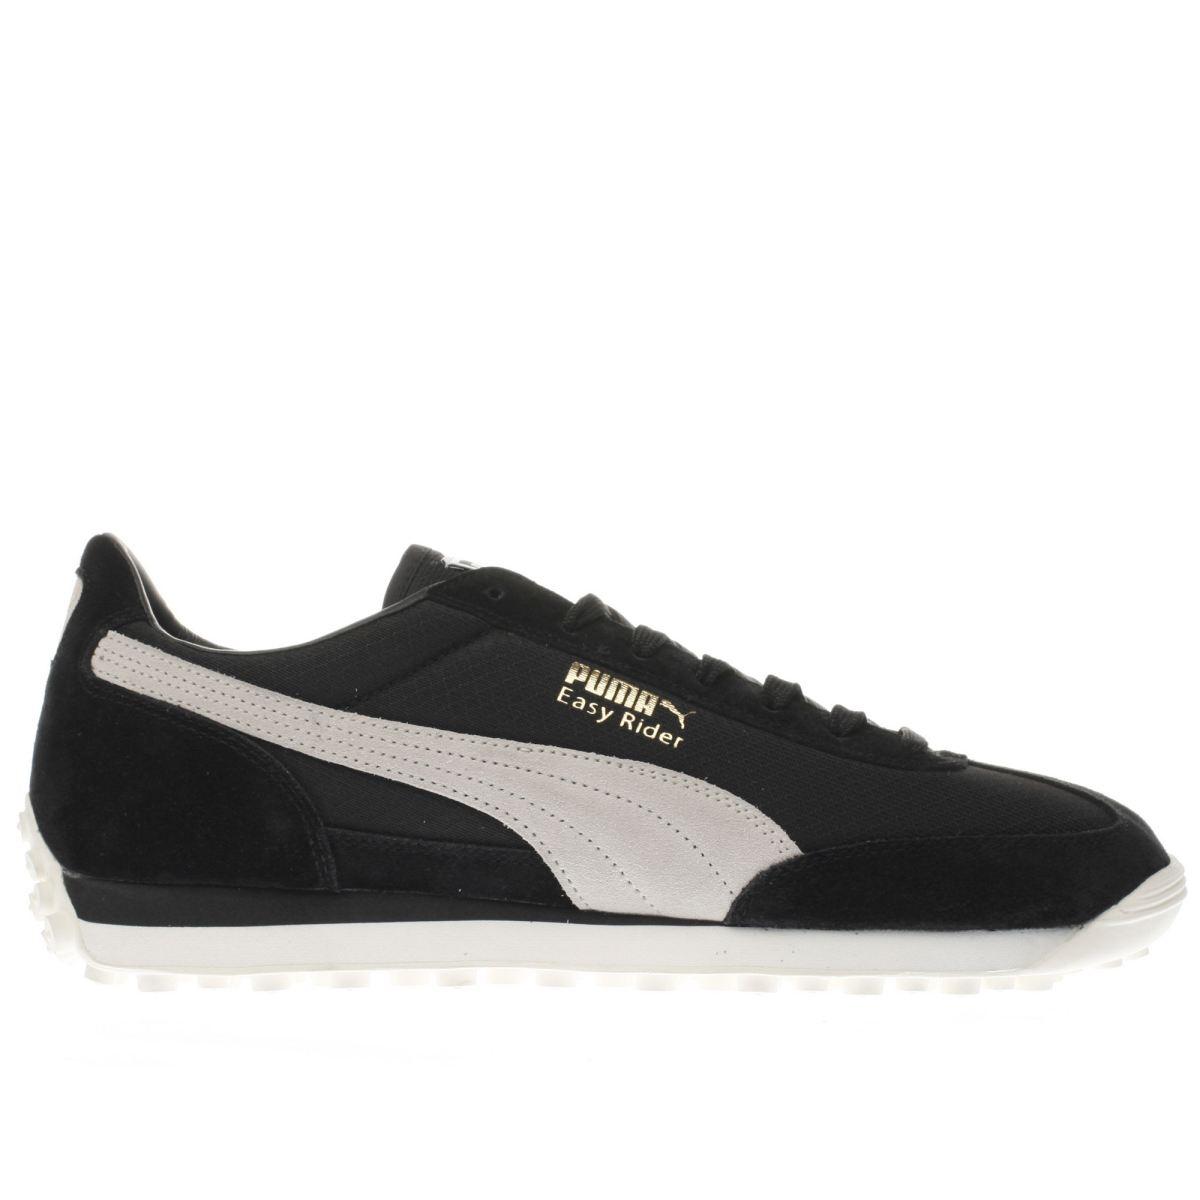 puma black & white easy rider trainers